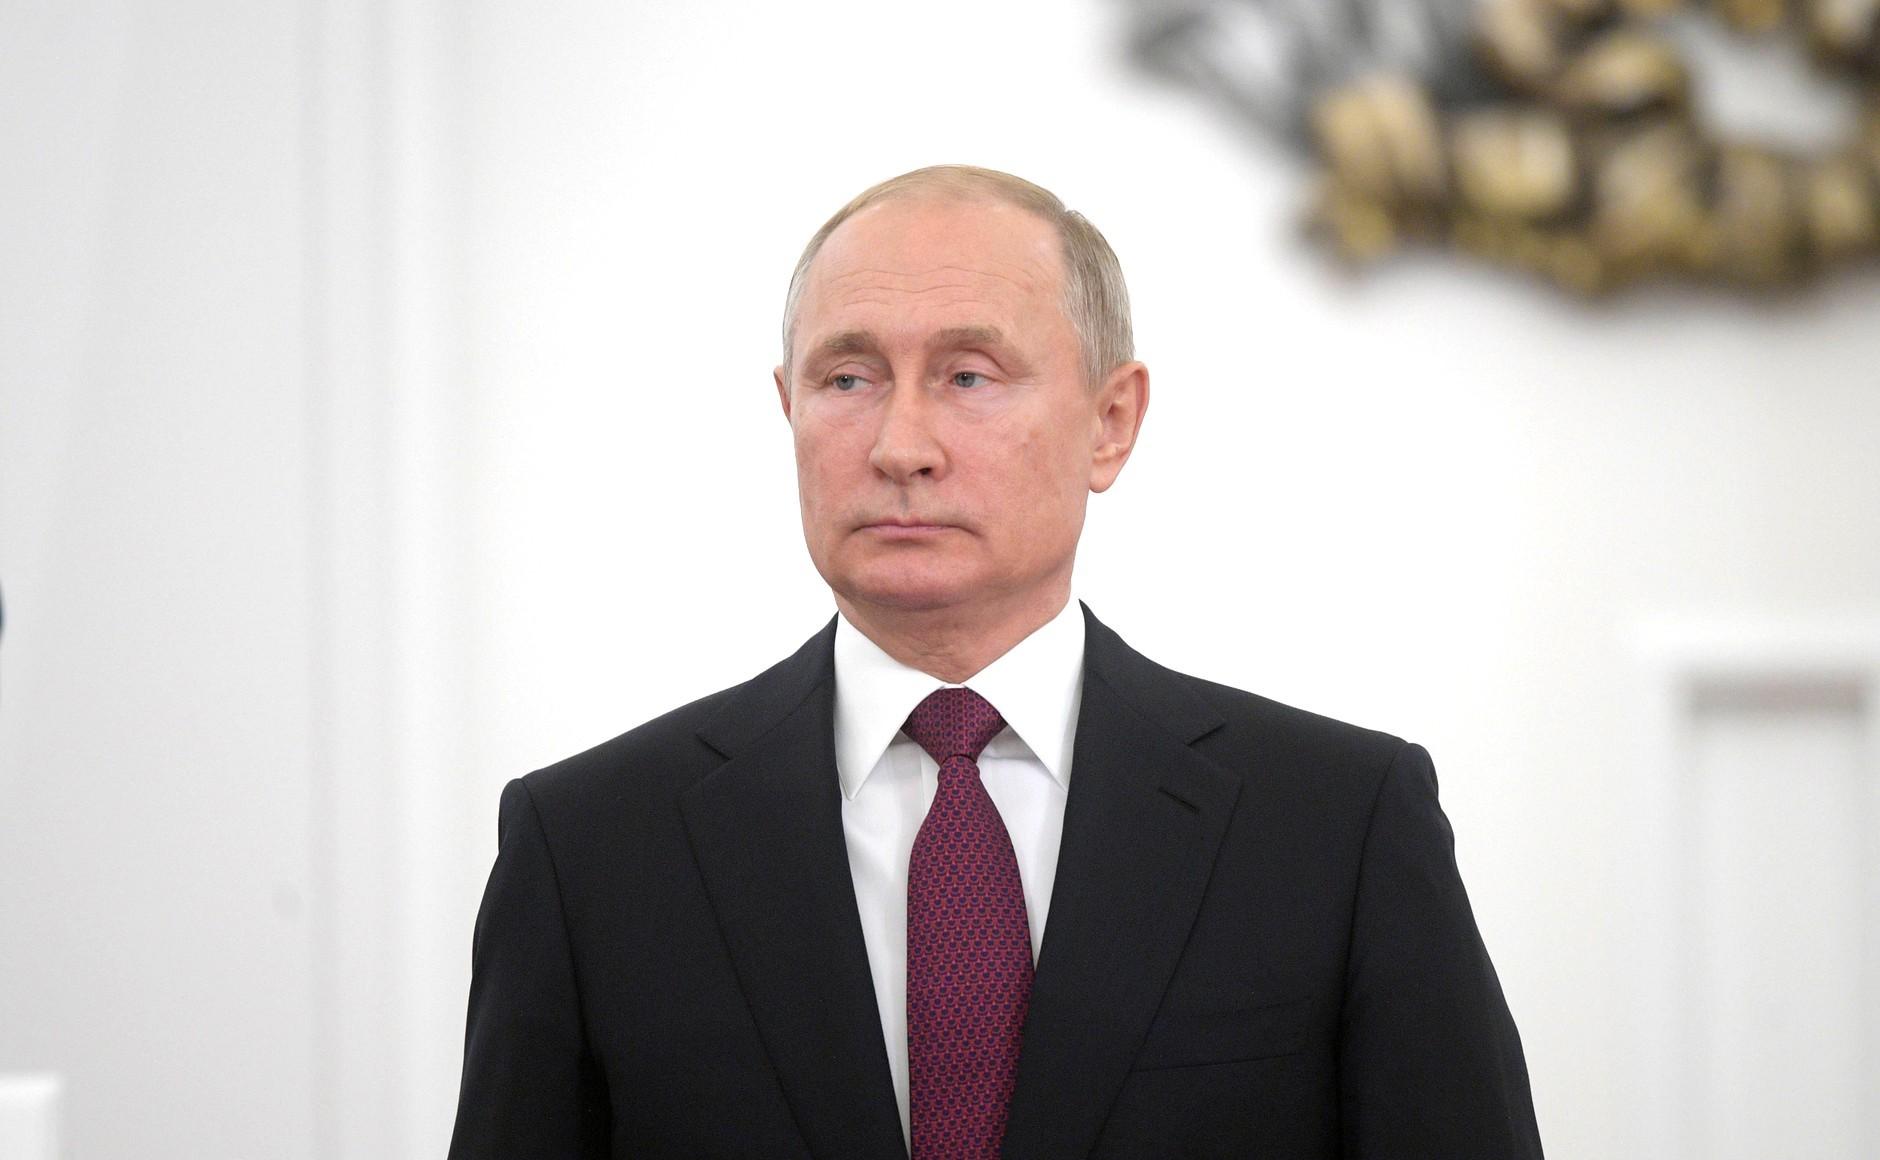 "<p>Владимир Путин. Фото ©<a href=""http://kremlin.ru/events/president/news/60736/photos/59466"" target=""_self"">Офицальный сайт президента России</a></p>"